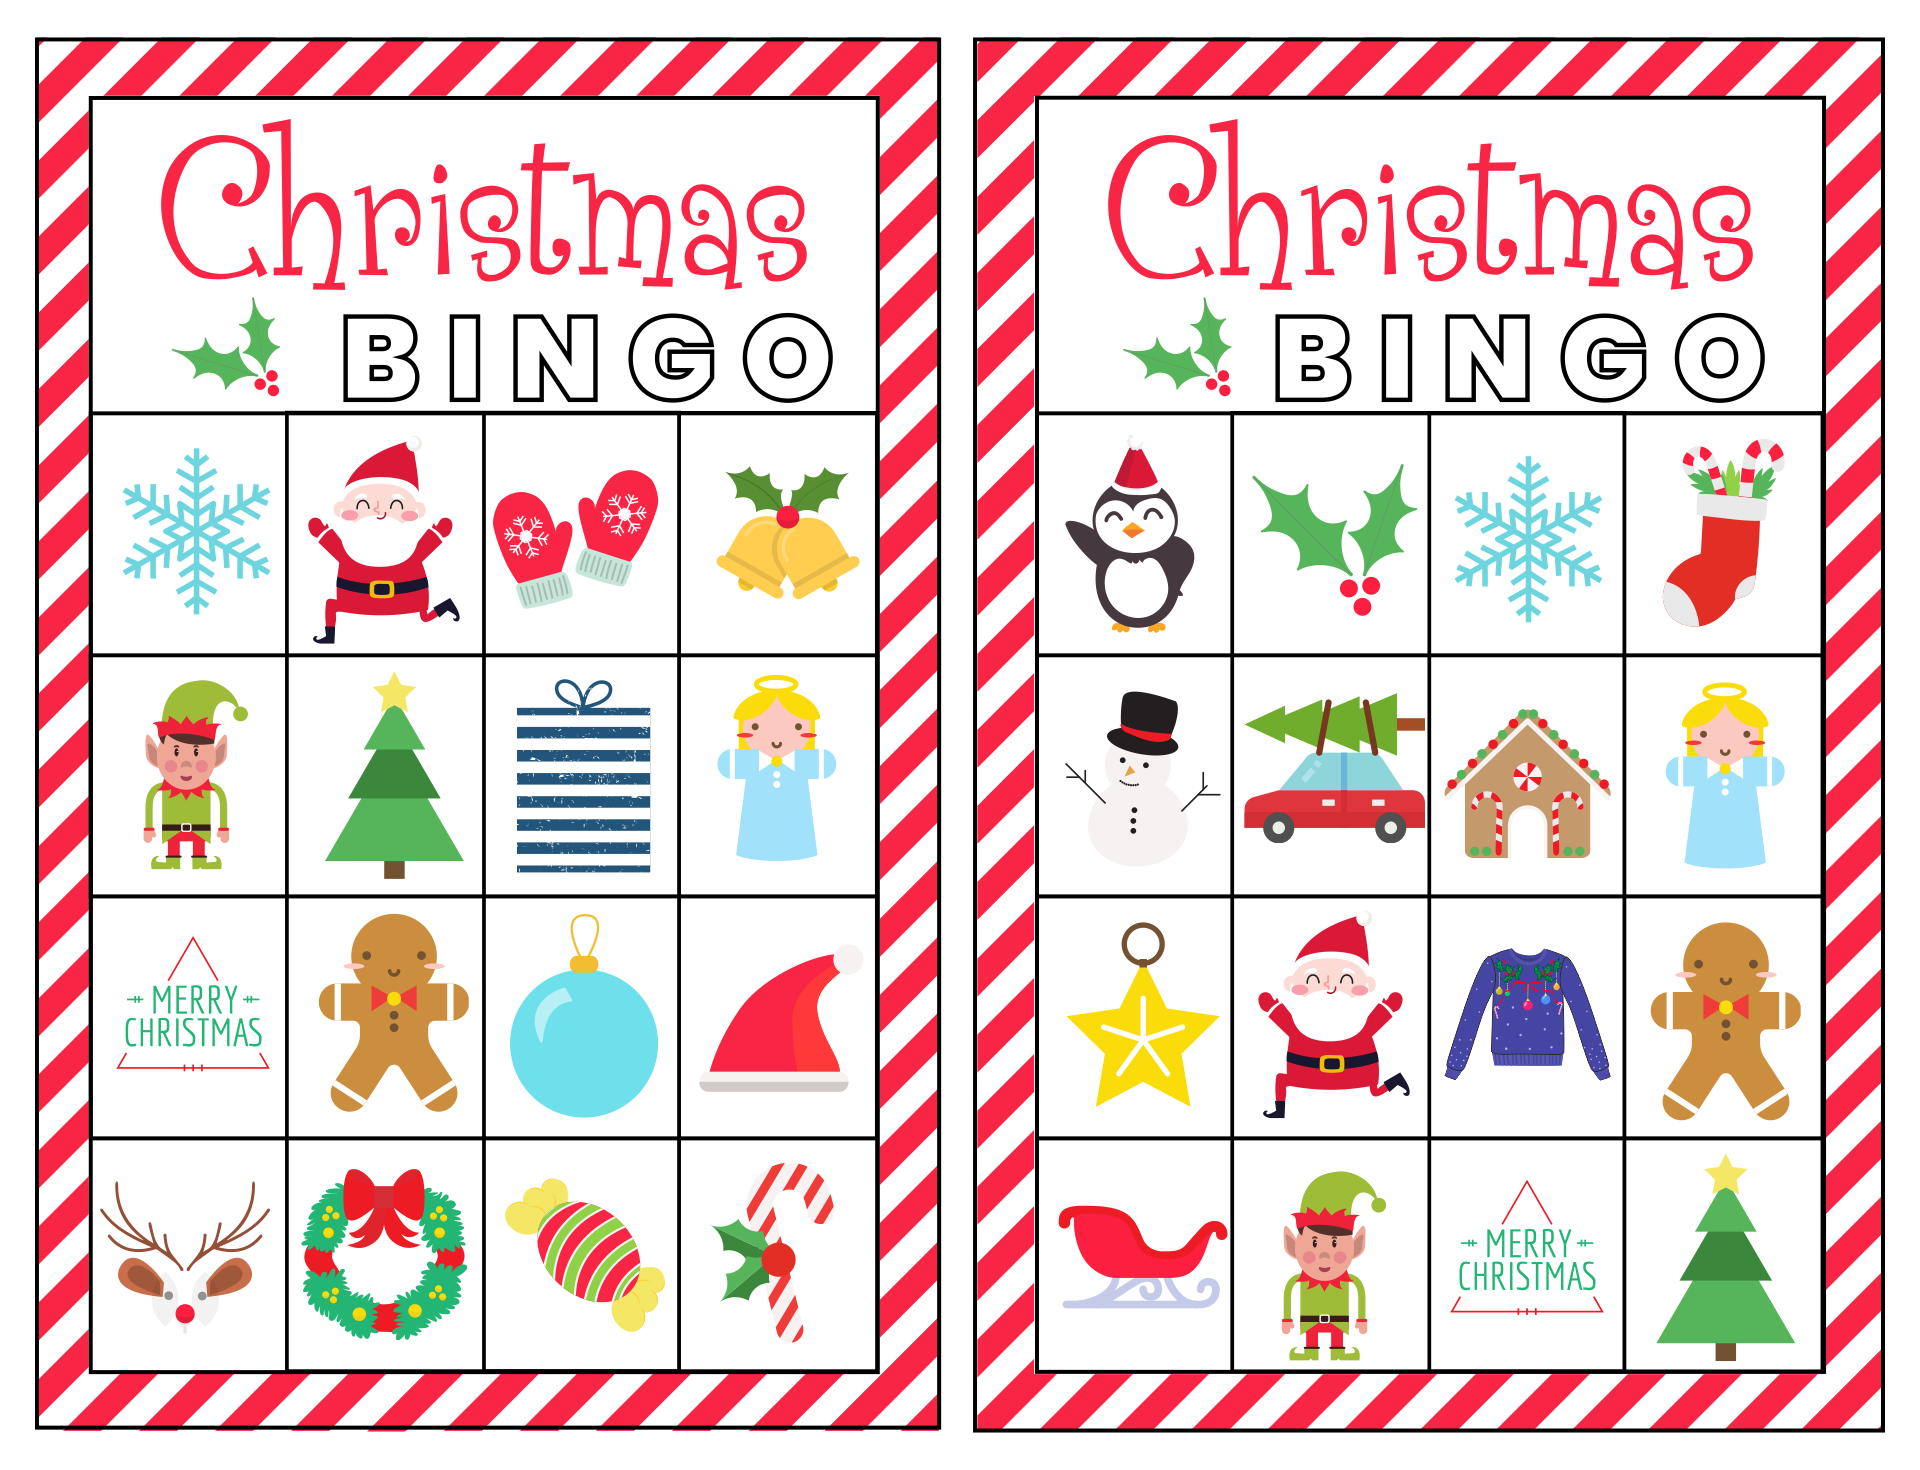 These Christmas Bingo Cards